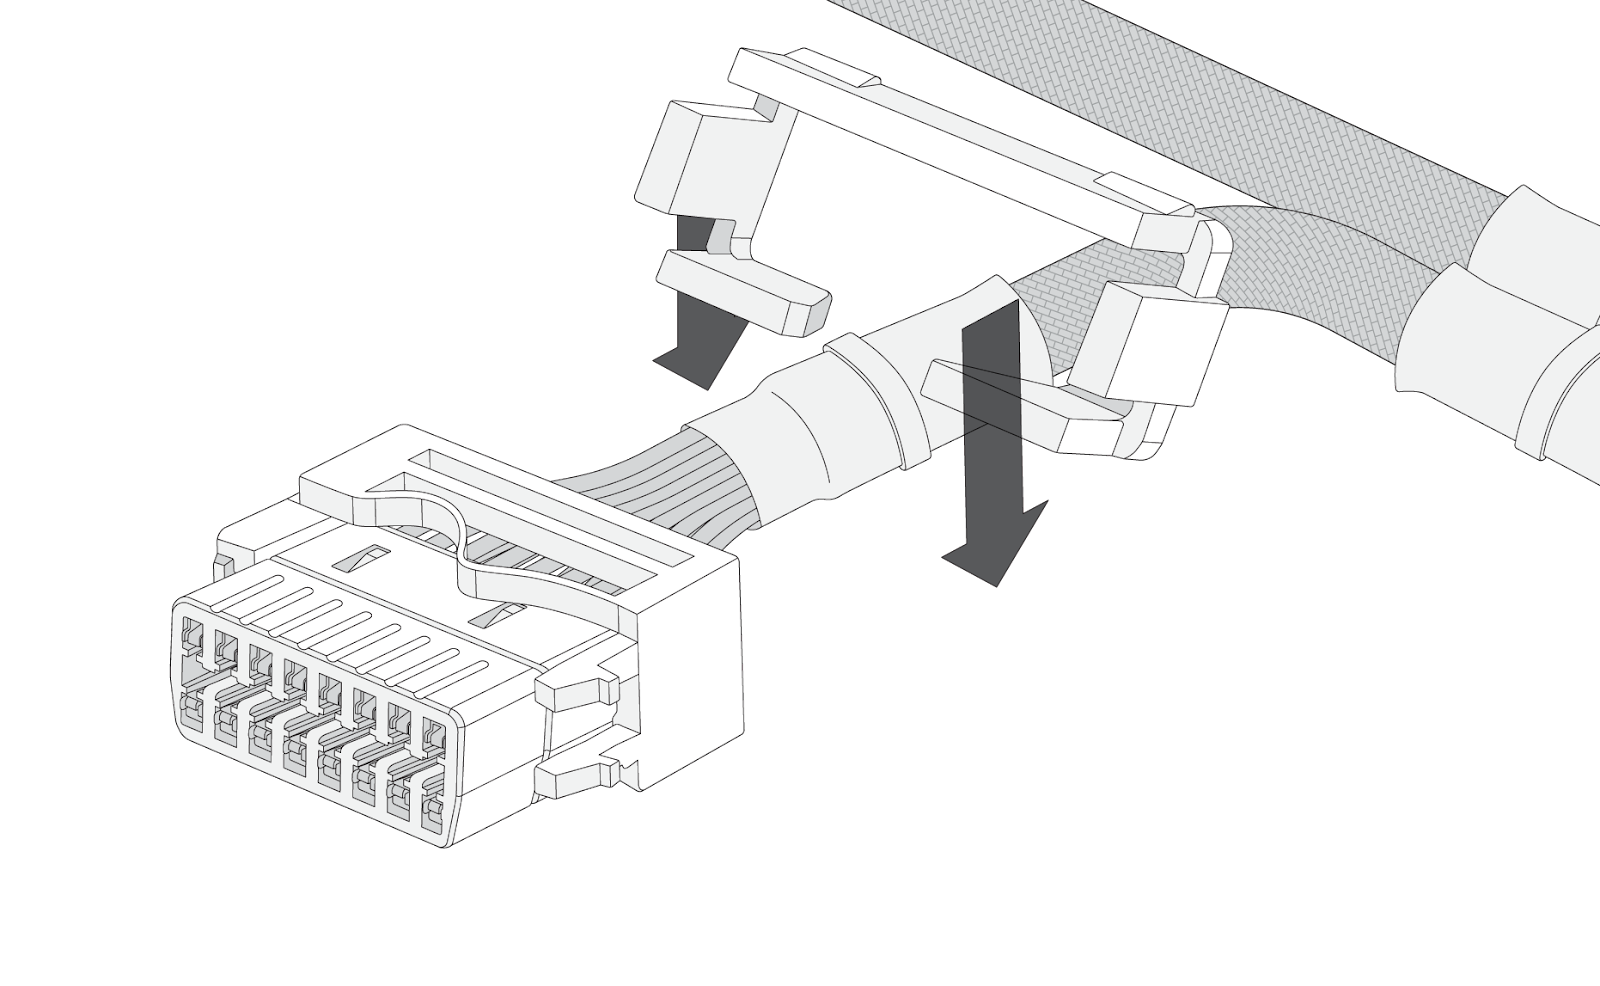 universal-harness-setup-figure12.png